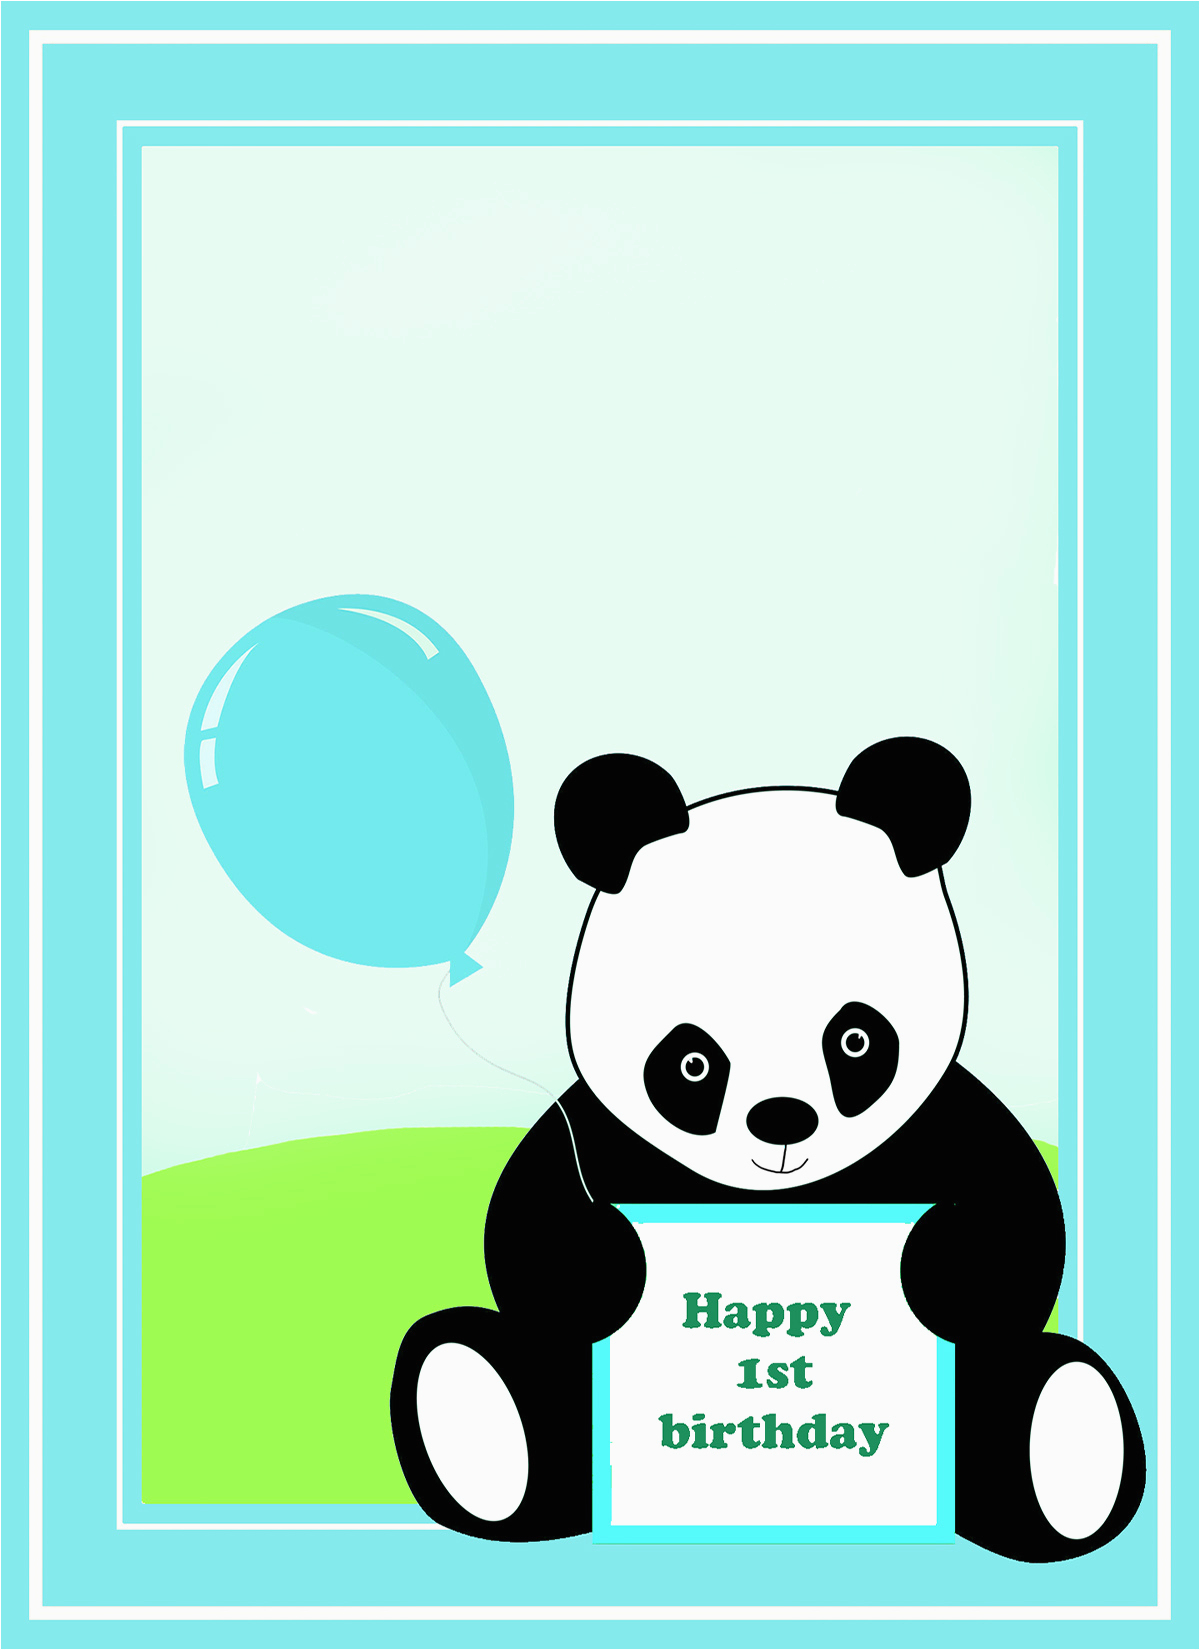 Panda Birthday Card Template   Birthdaybuzz - Panda Bear Invitations Free Printable